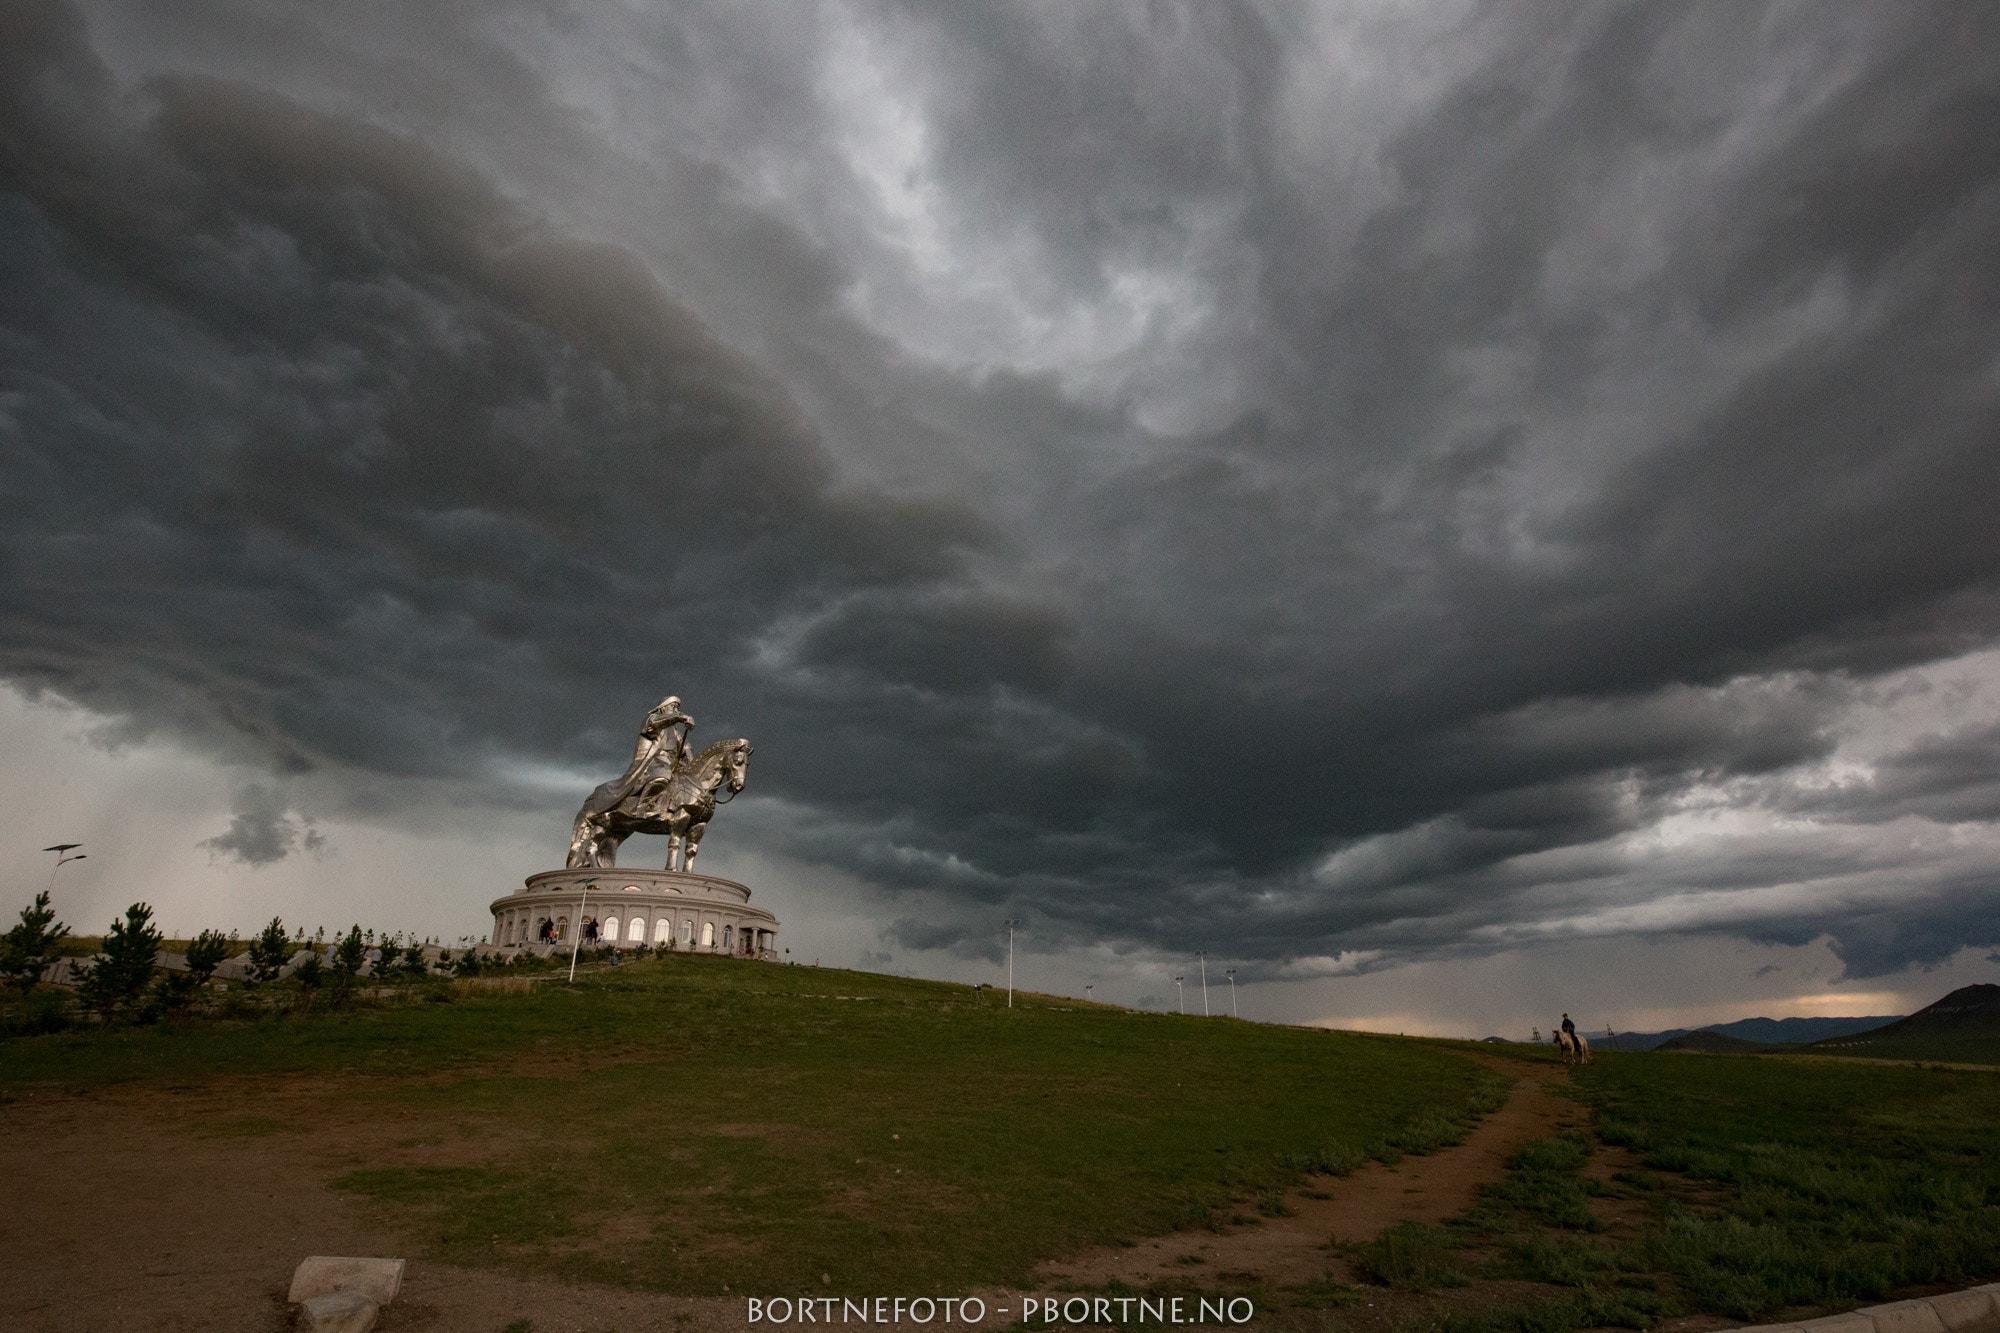 nyegolfsko-bortnefoto-43-jpg-jpg.jpg